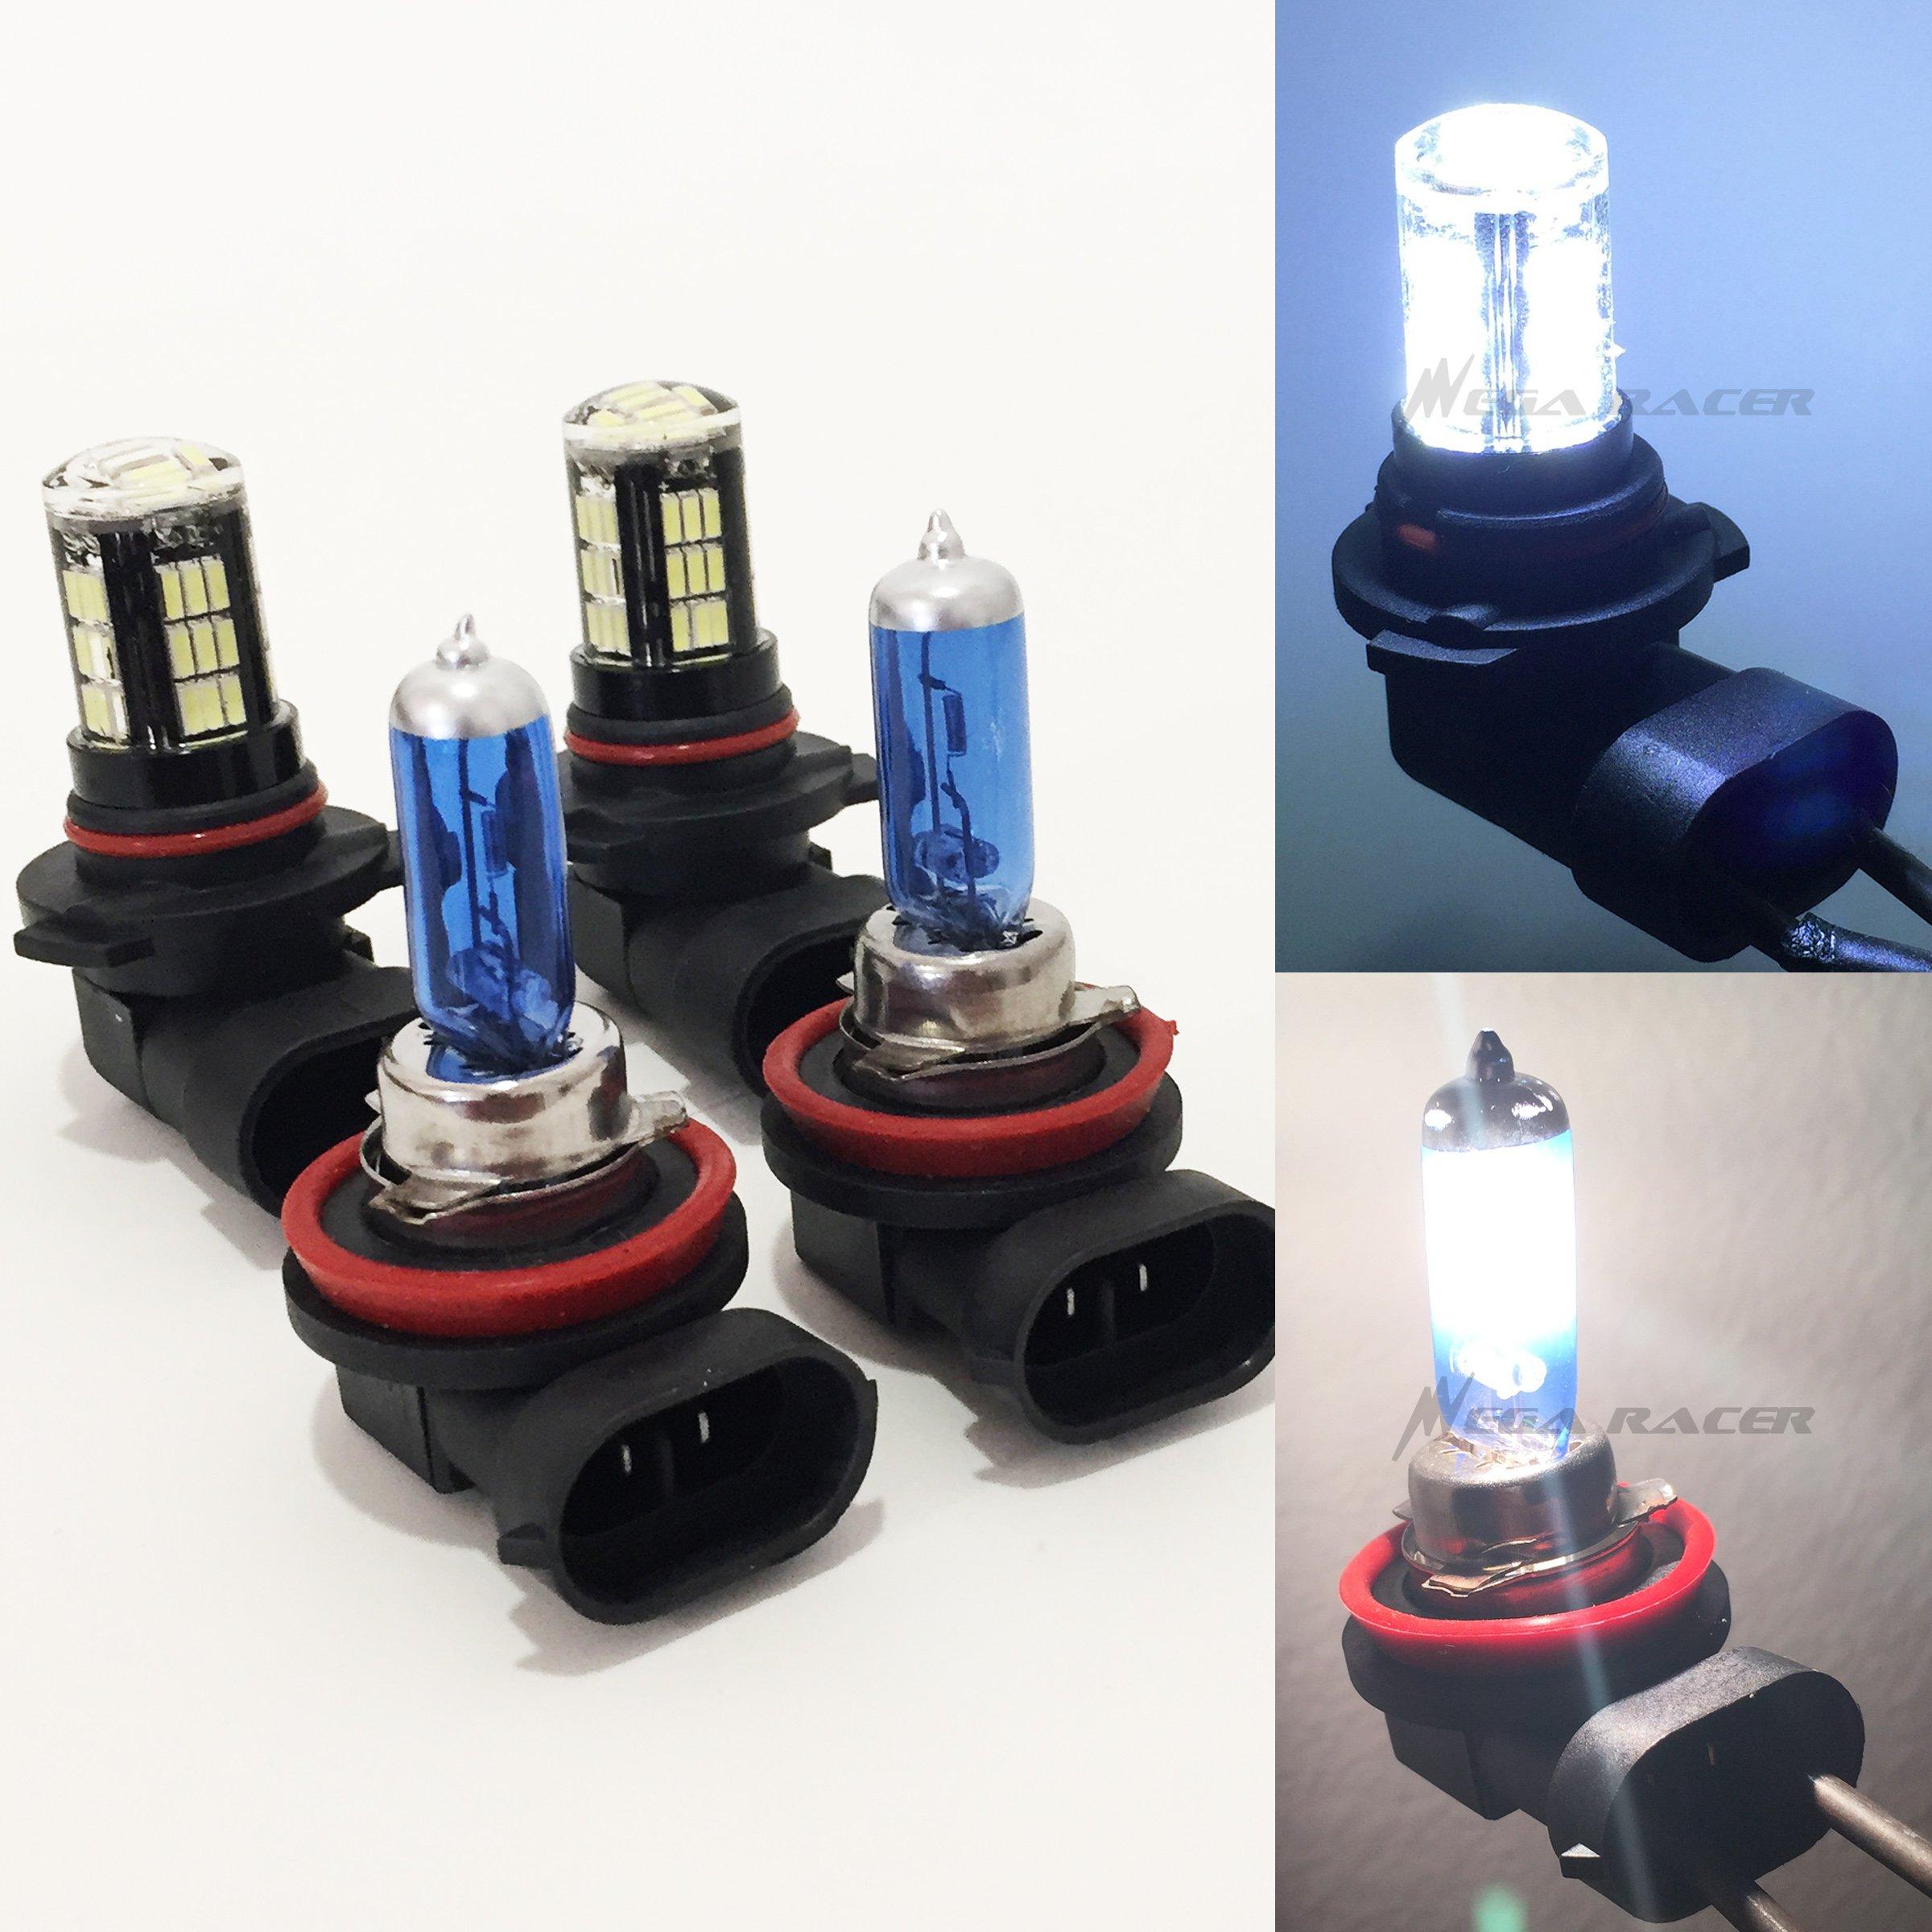 H11 9005 SUPER WHITE 100 WAT XENON HID HALOGEN LIGHT BULBS LOW/&HIGH BEAM COMBO